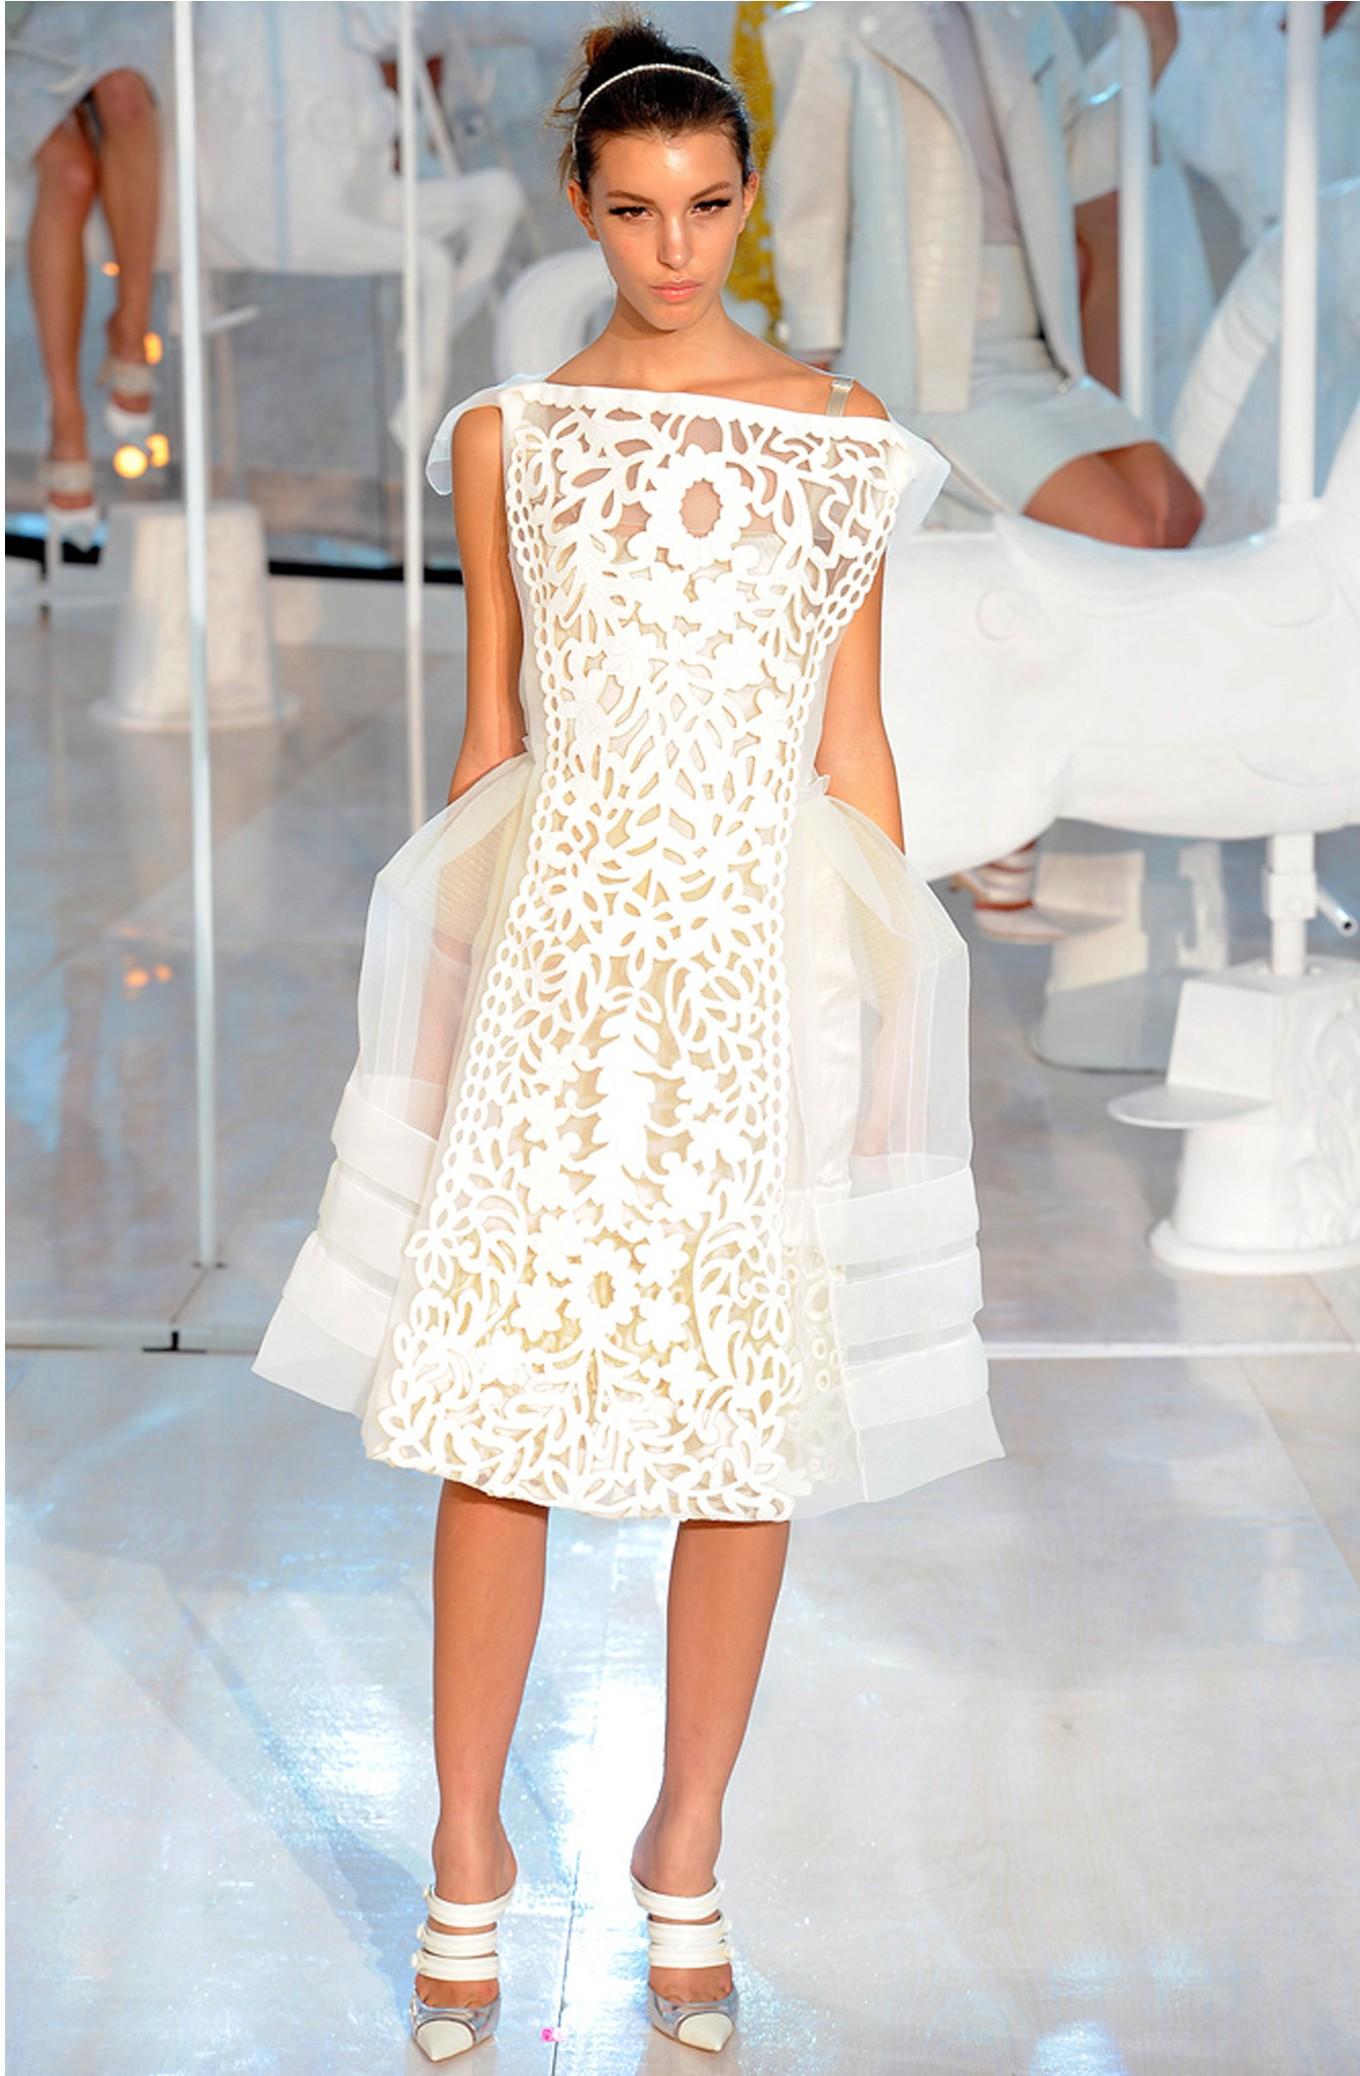 Louis Vuitton Spring 2012 RTW -- ST OK - Ricamificio Paolo Italy - The Italian Embroidery